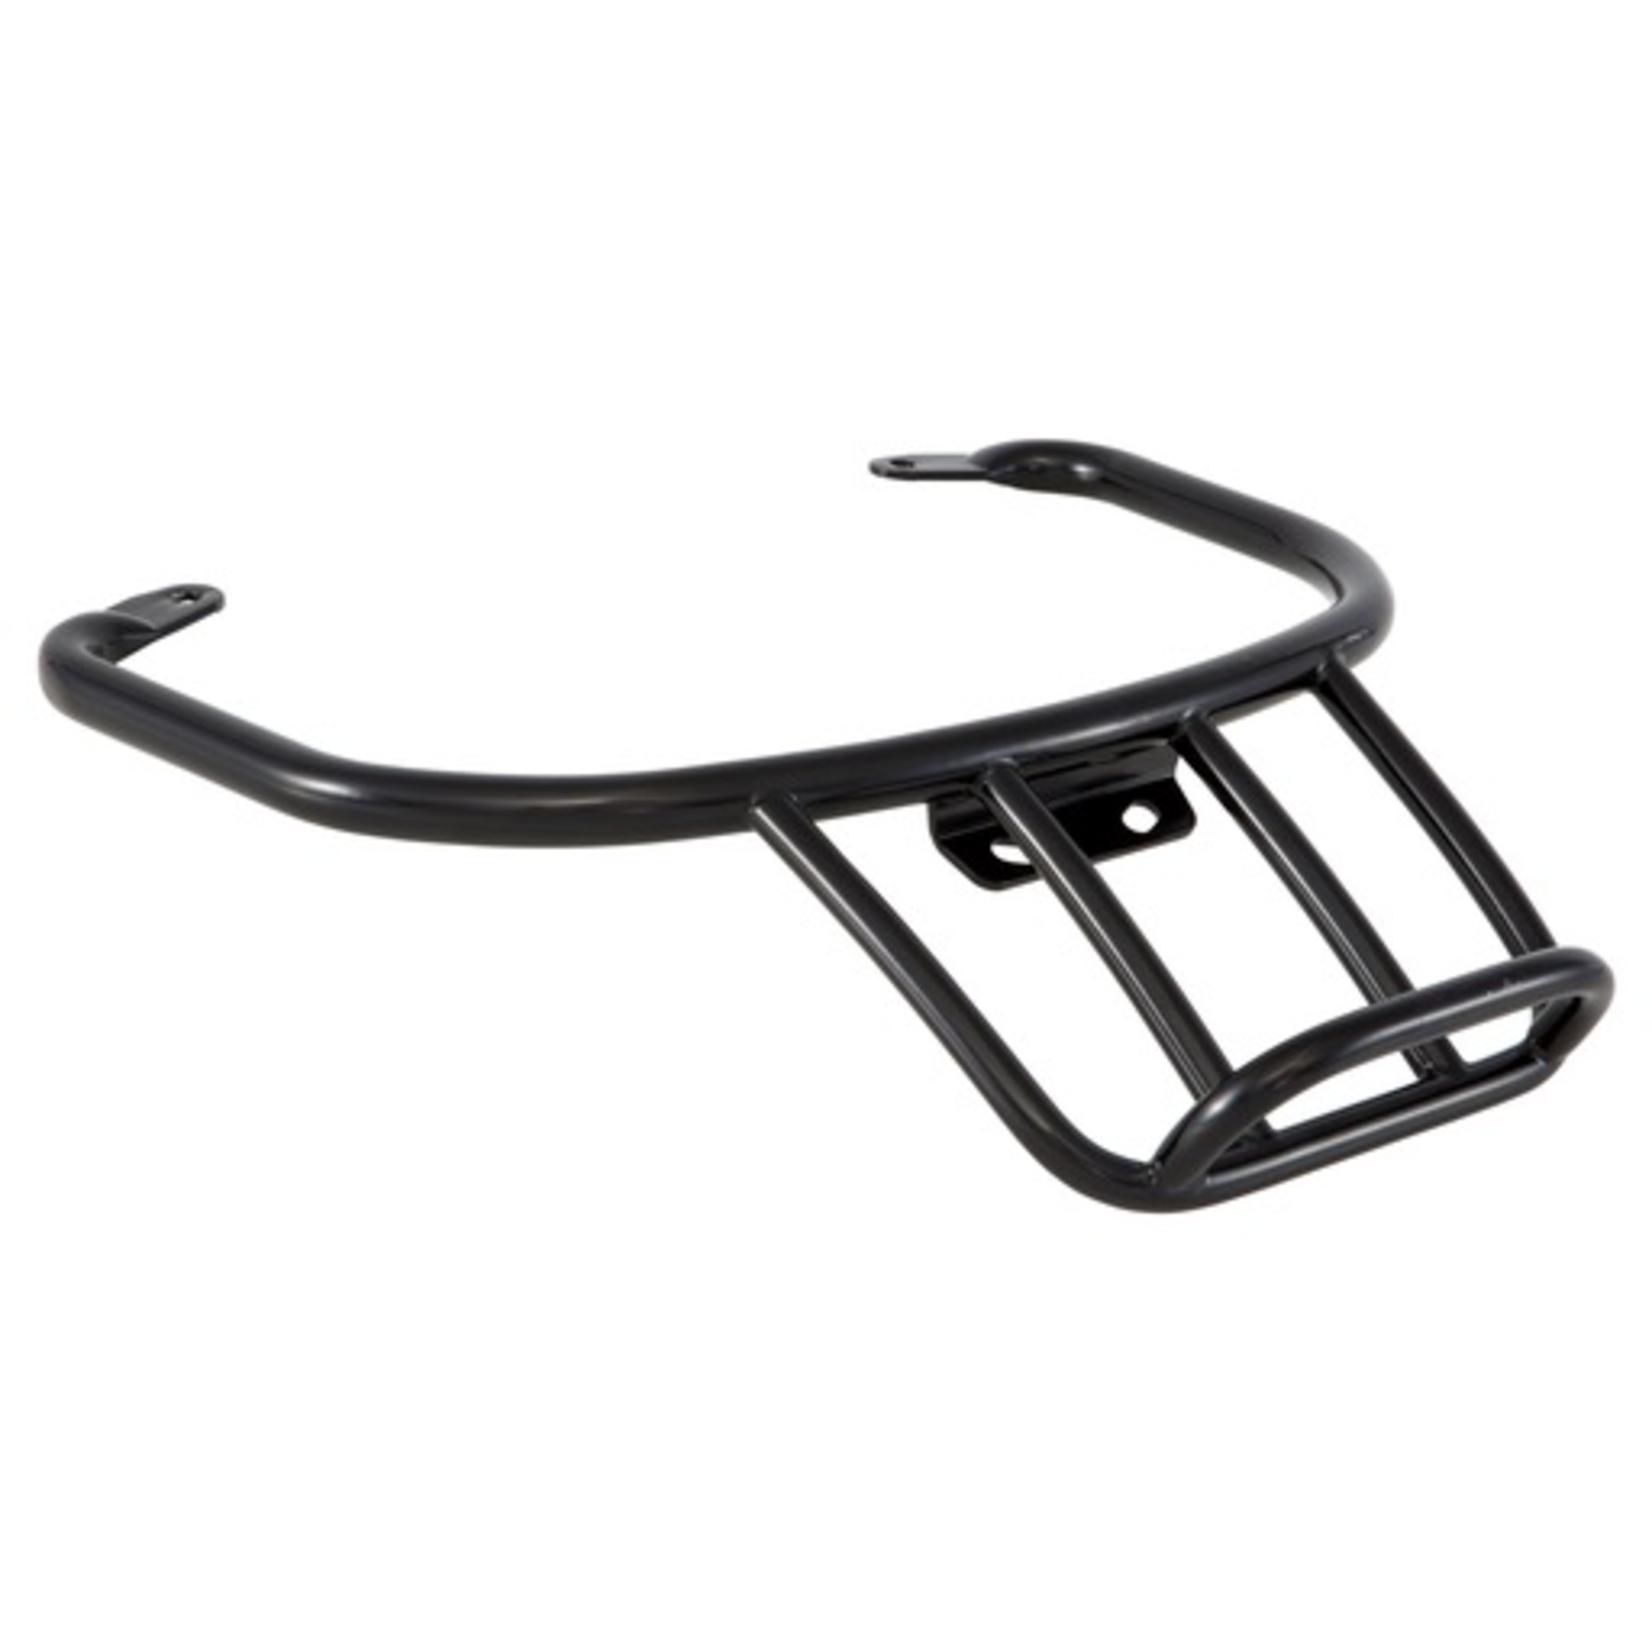 Accessories Rack, Primavera/Sprint 70's Grab Handle Luggage Rack Black